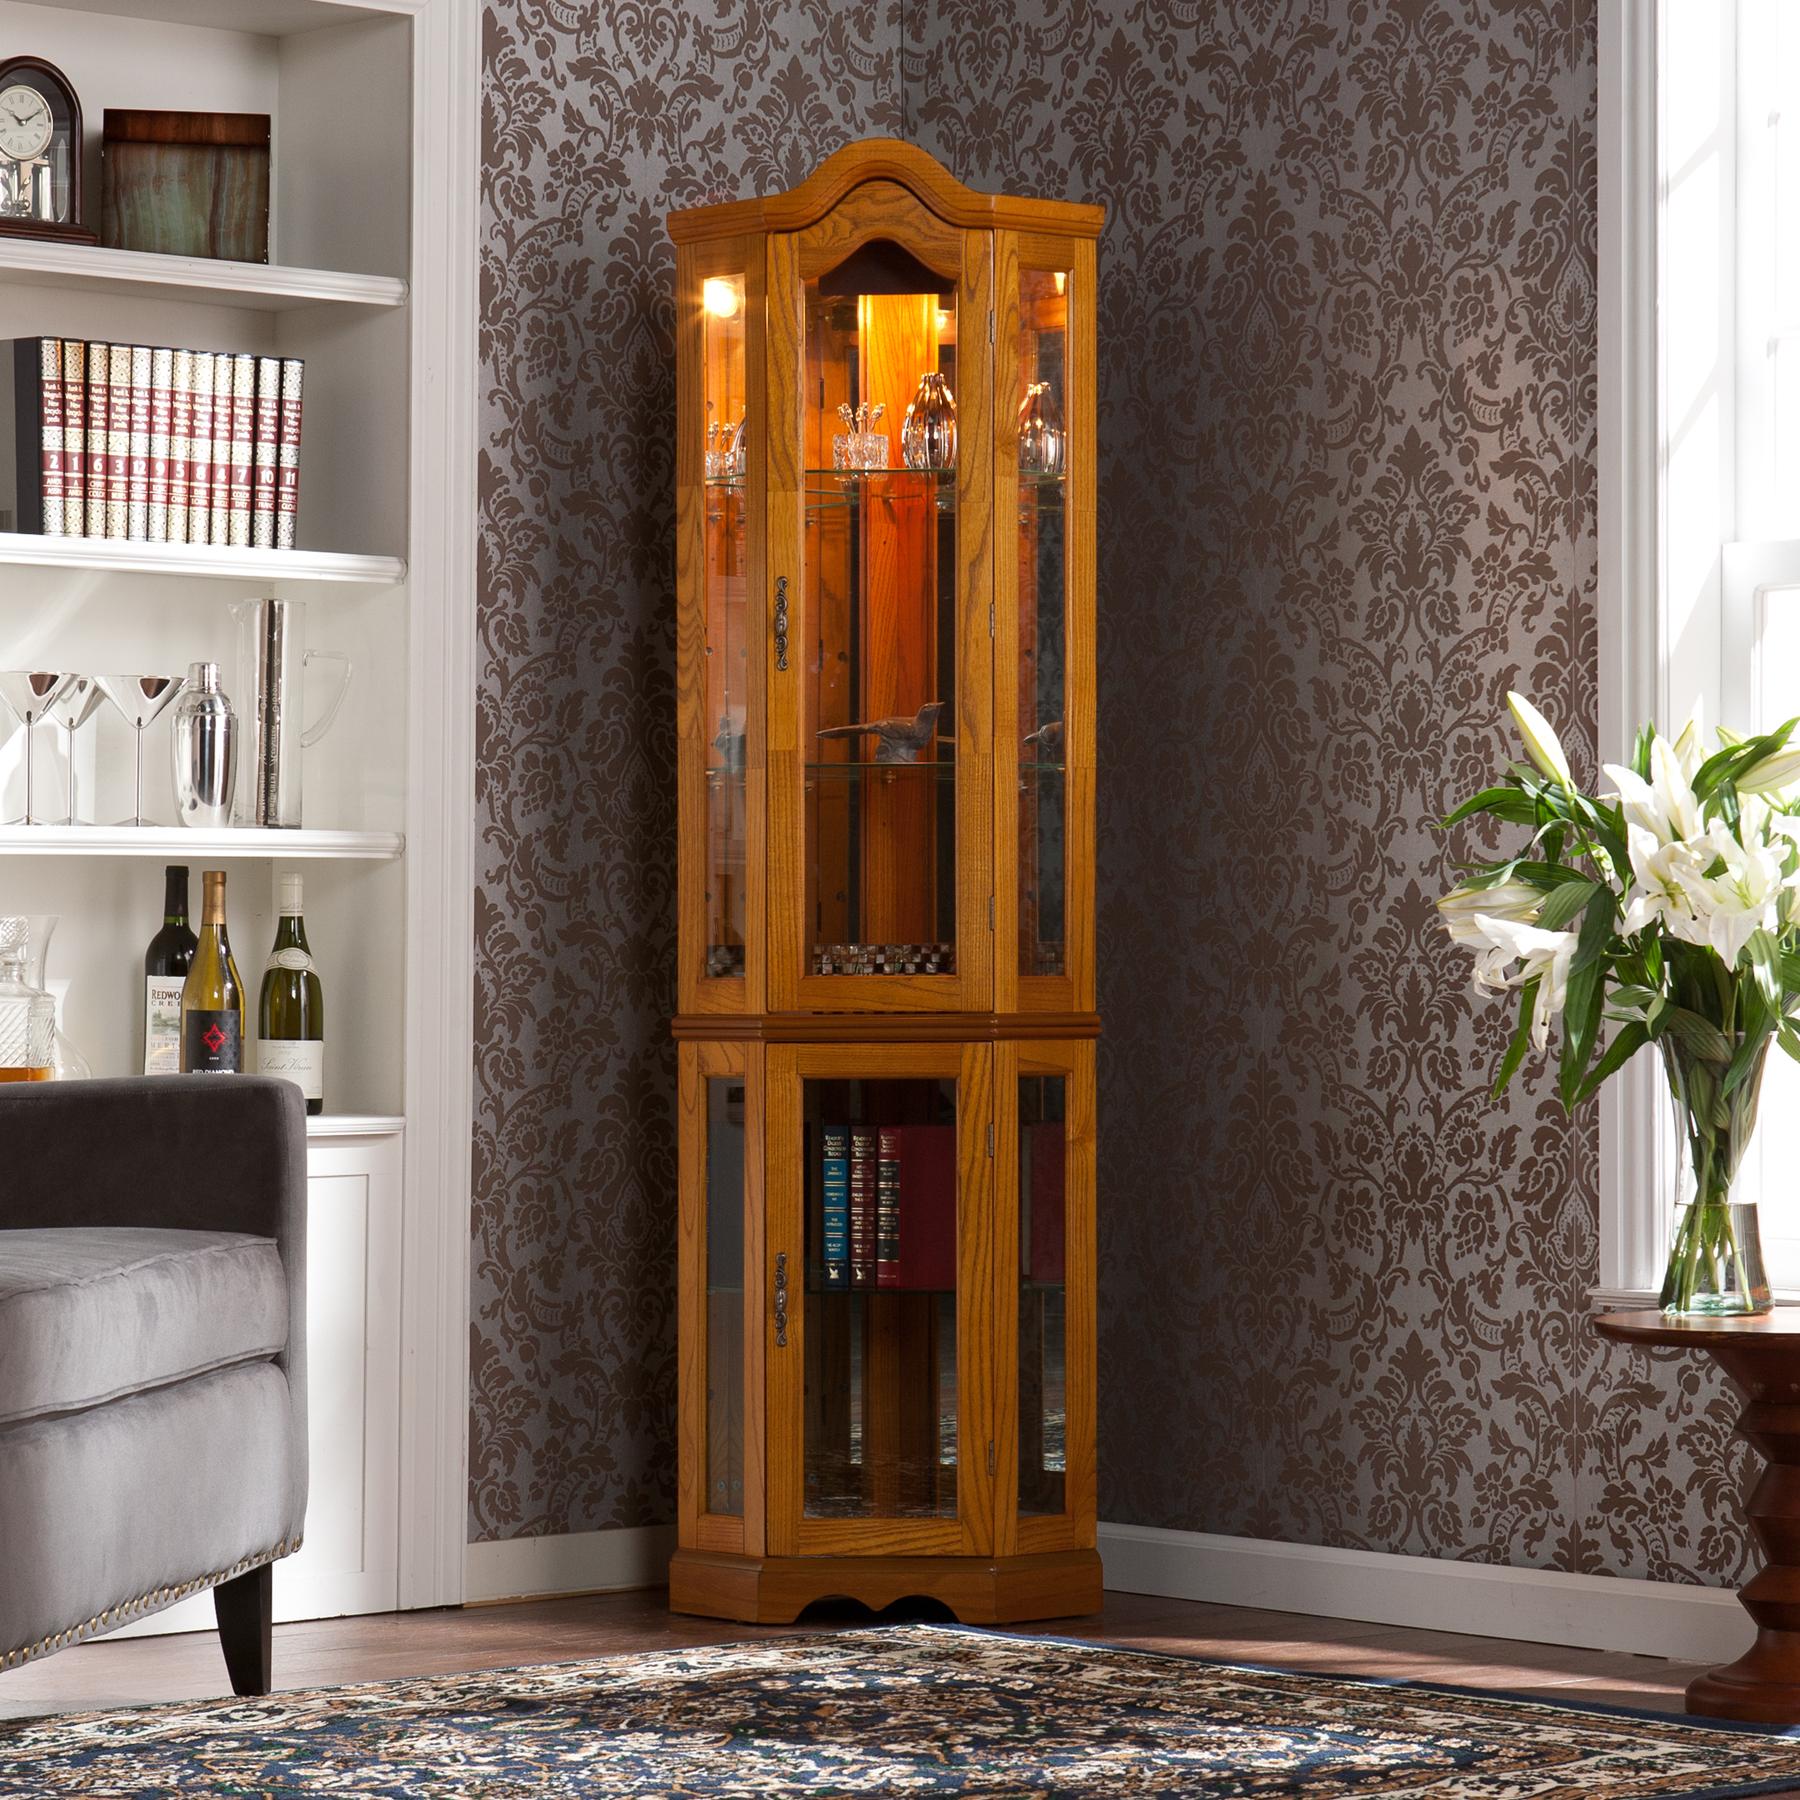 Fantastic Console Curio Cabinets, Display Cabinet, Curio, Cabinet, Curio Cabinet CB65